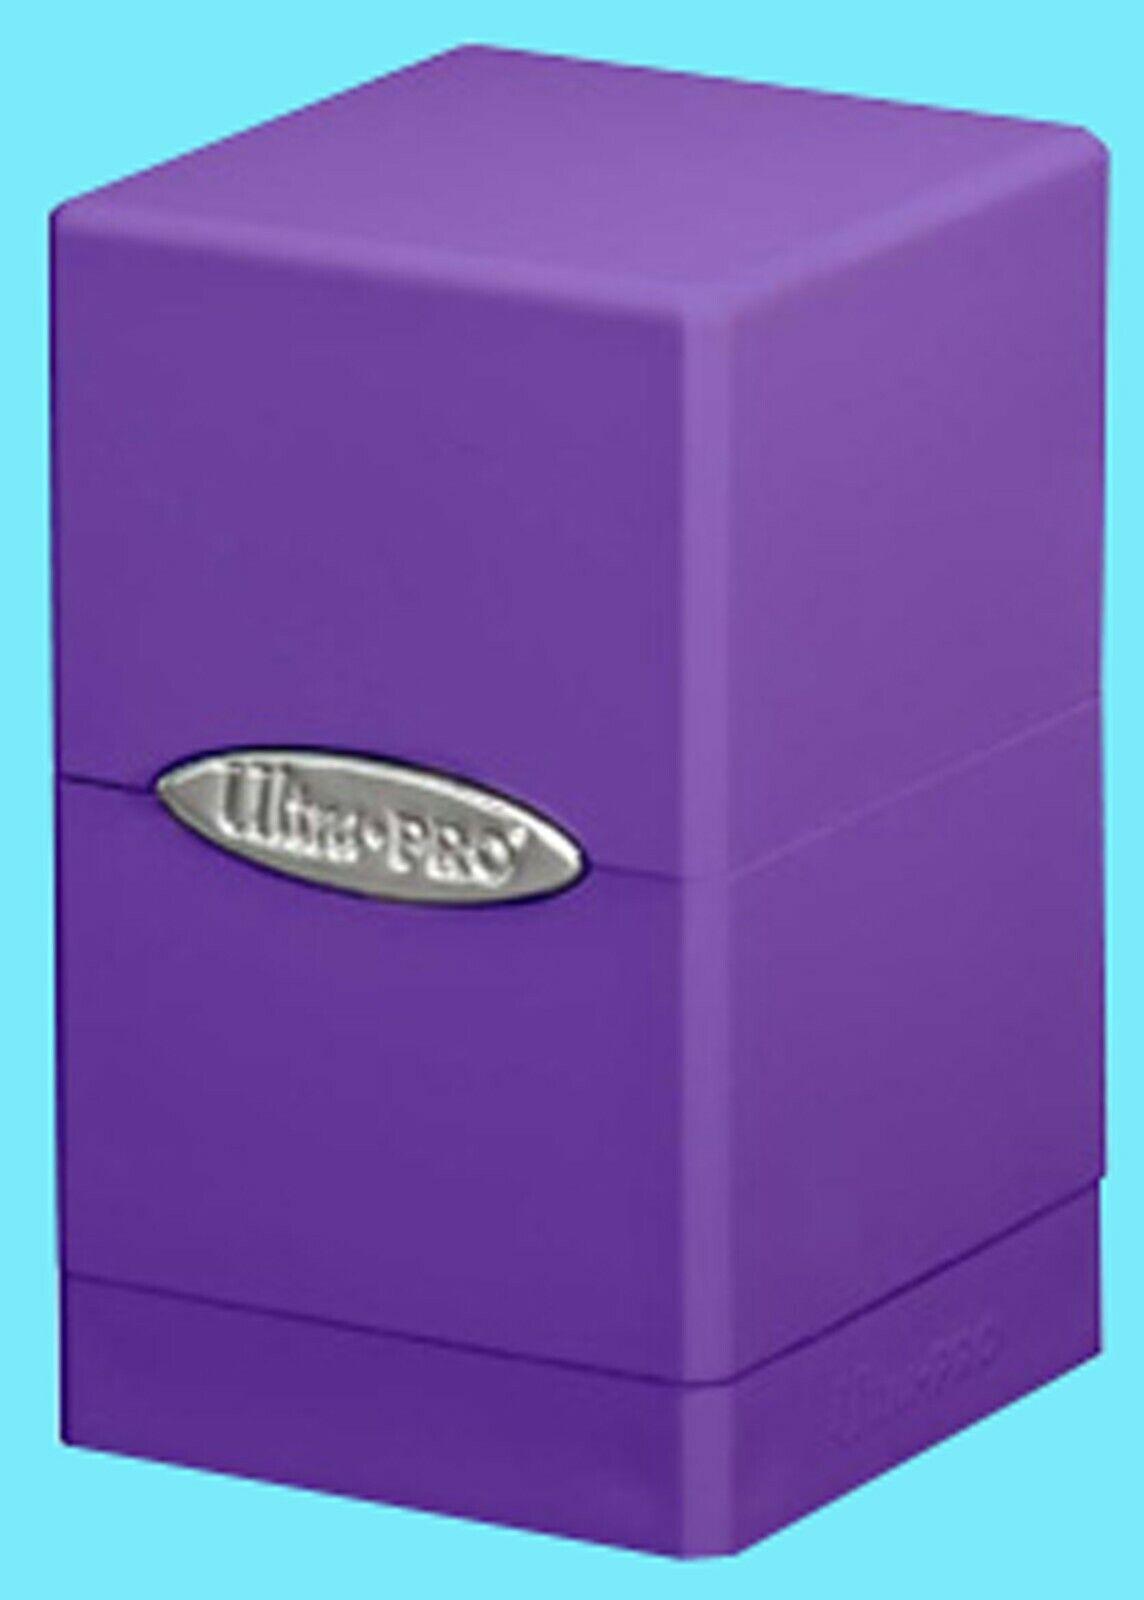 Ultra-Pro Purple Satin Tower Deck Box